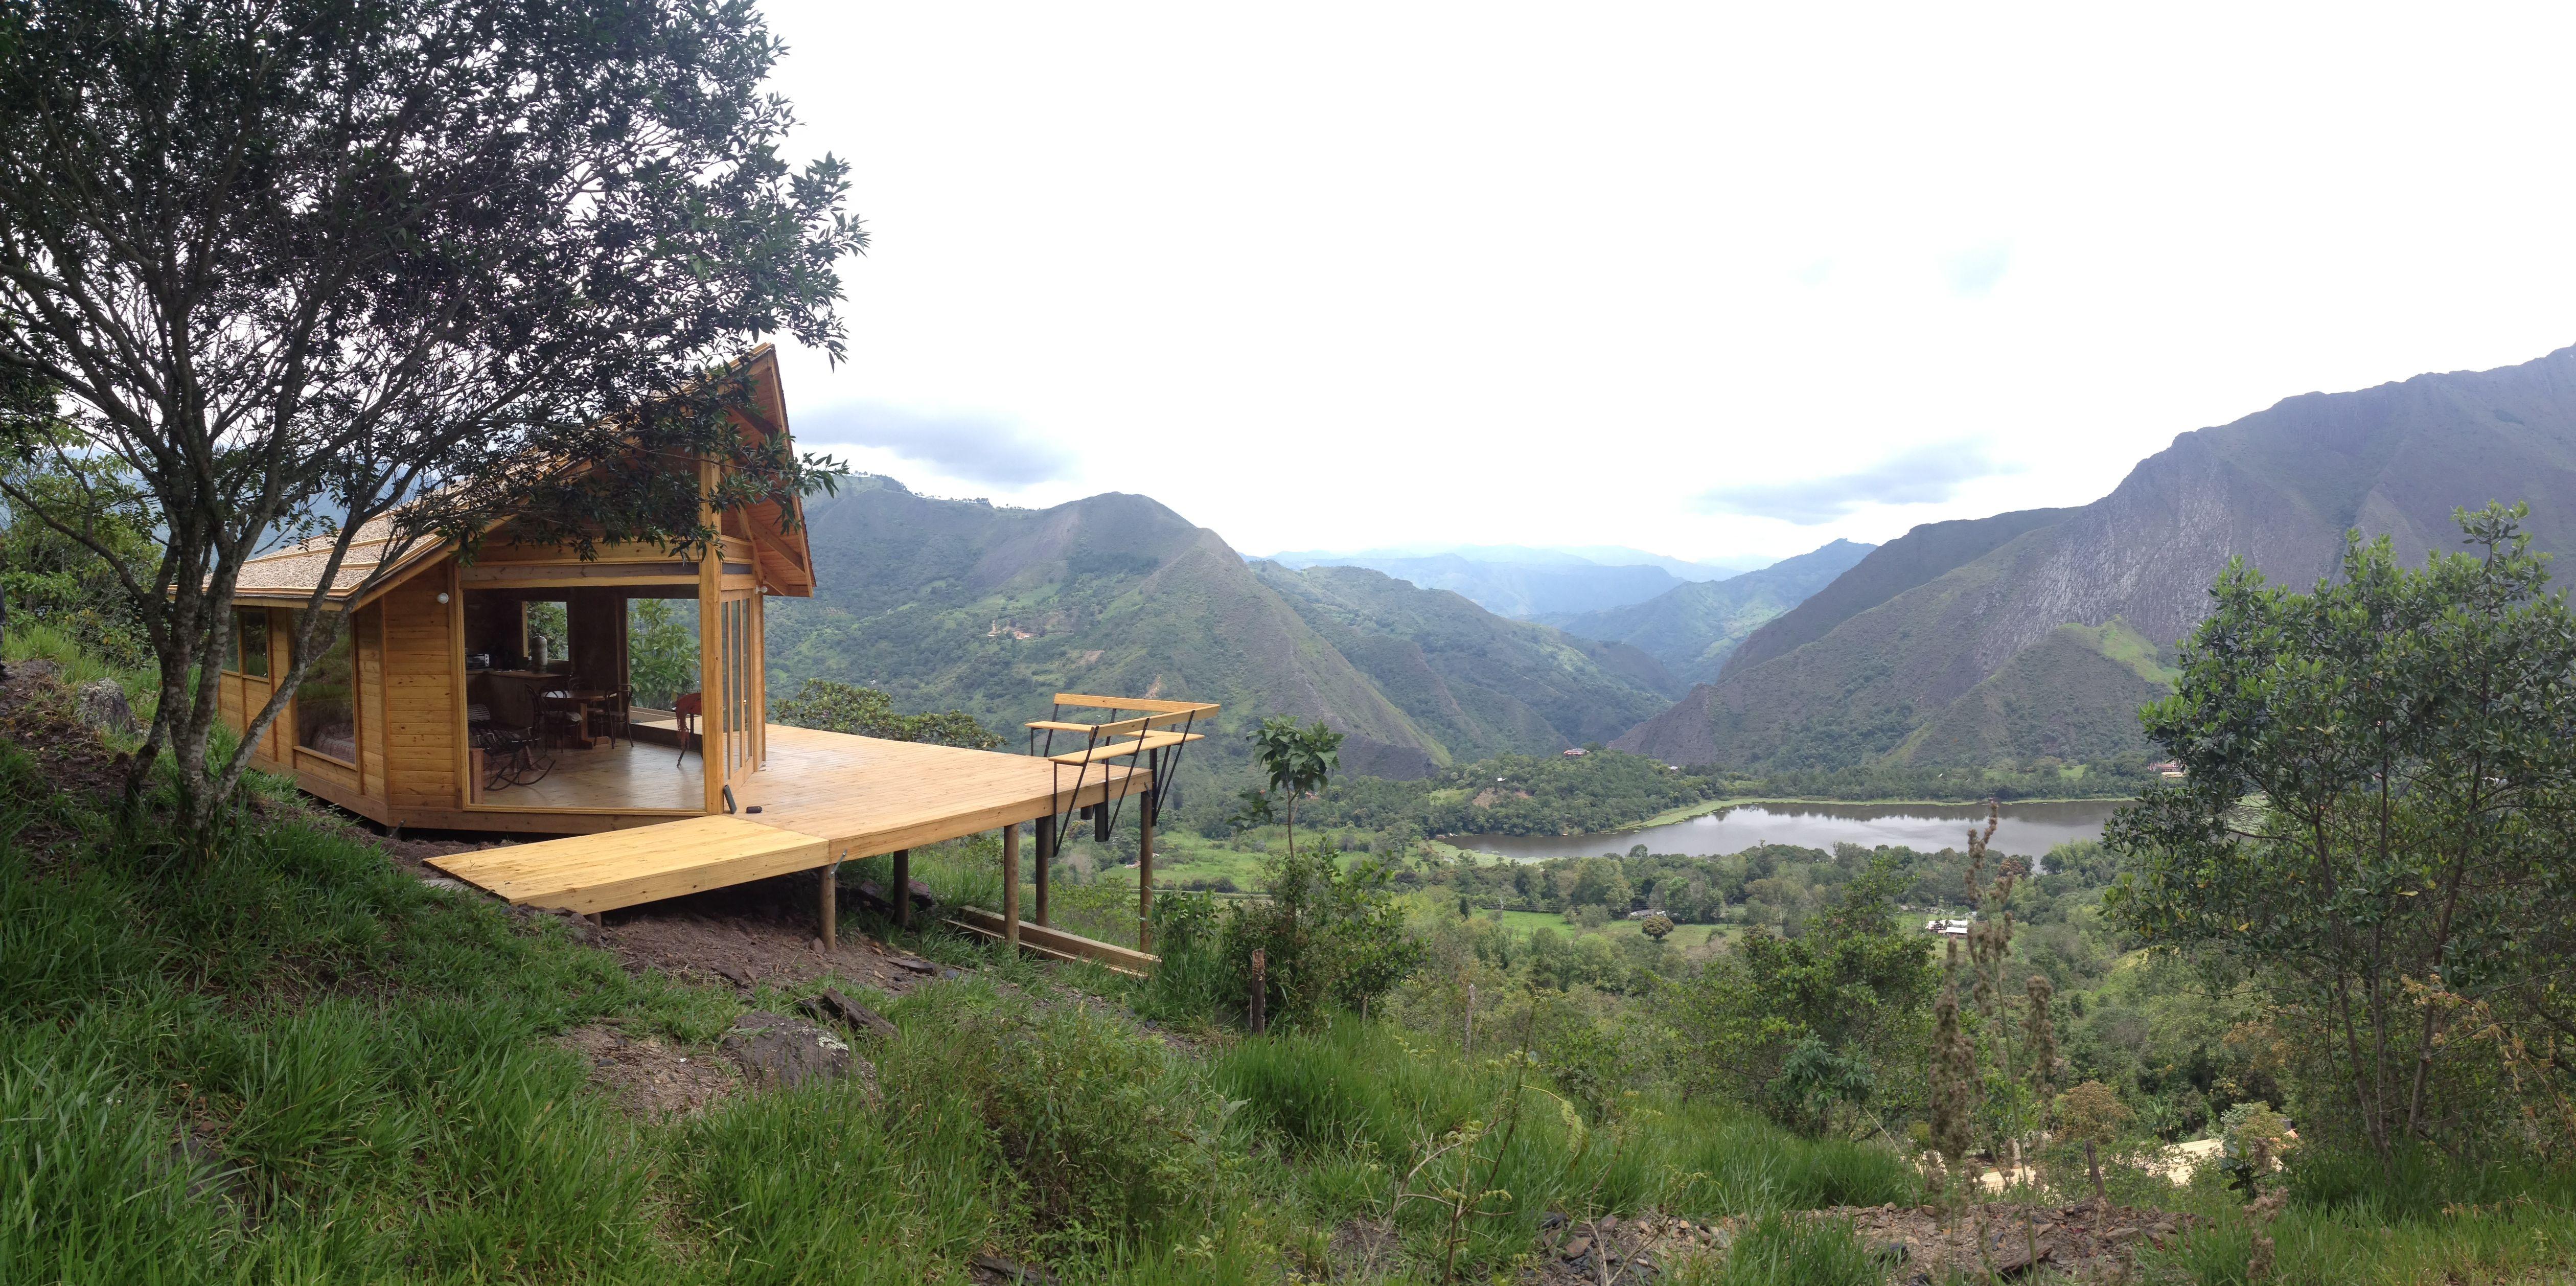 Refugio en madera - Pacho, colombia TDE #woodarchitecture #wood #madera #casasenmadera #arquitecturaenmadera http://www.tallerdensamble.com